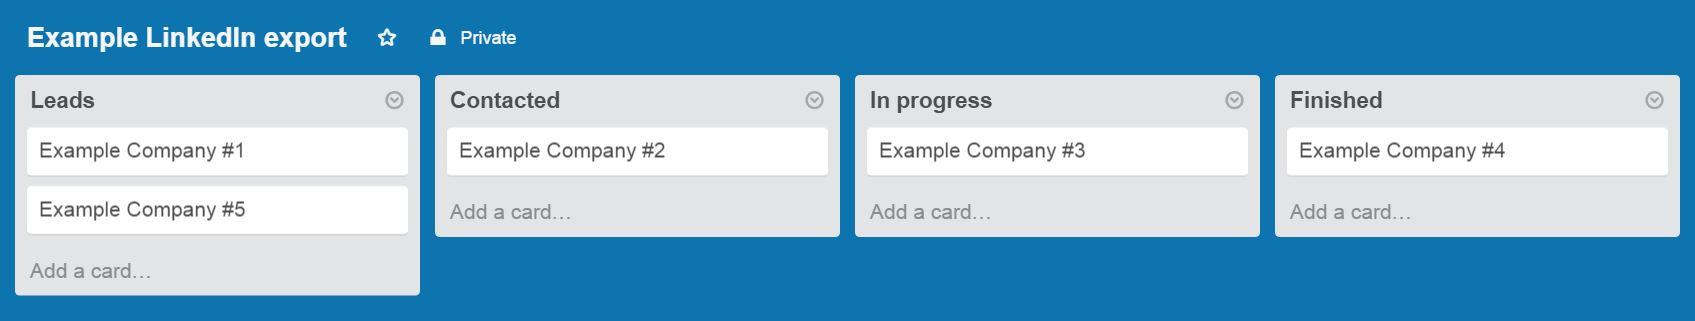 Example LinkedIn export in Trello